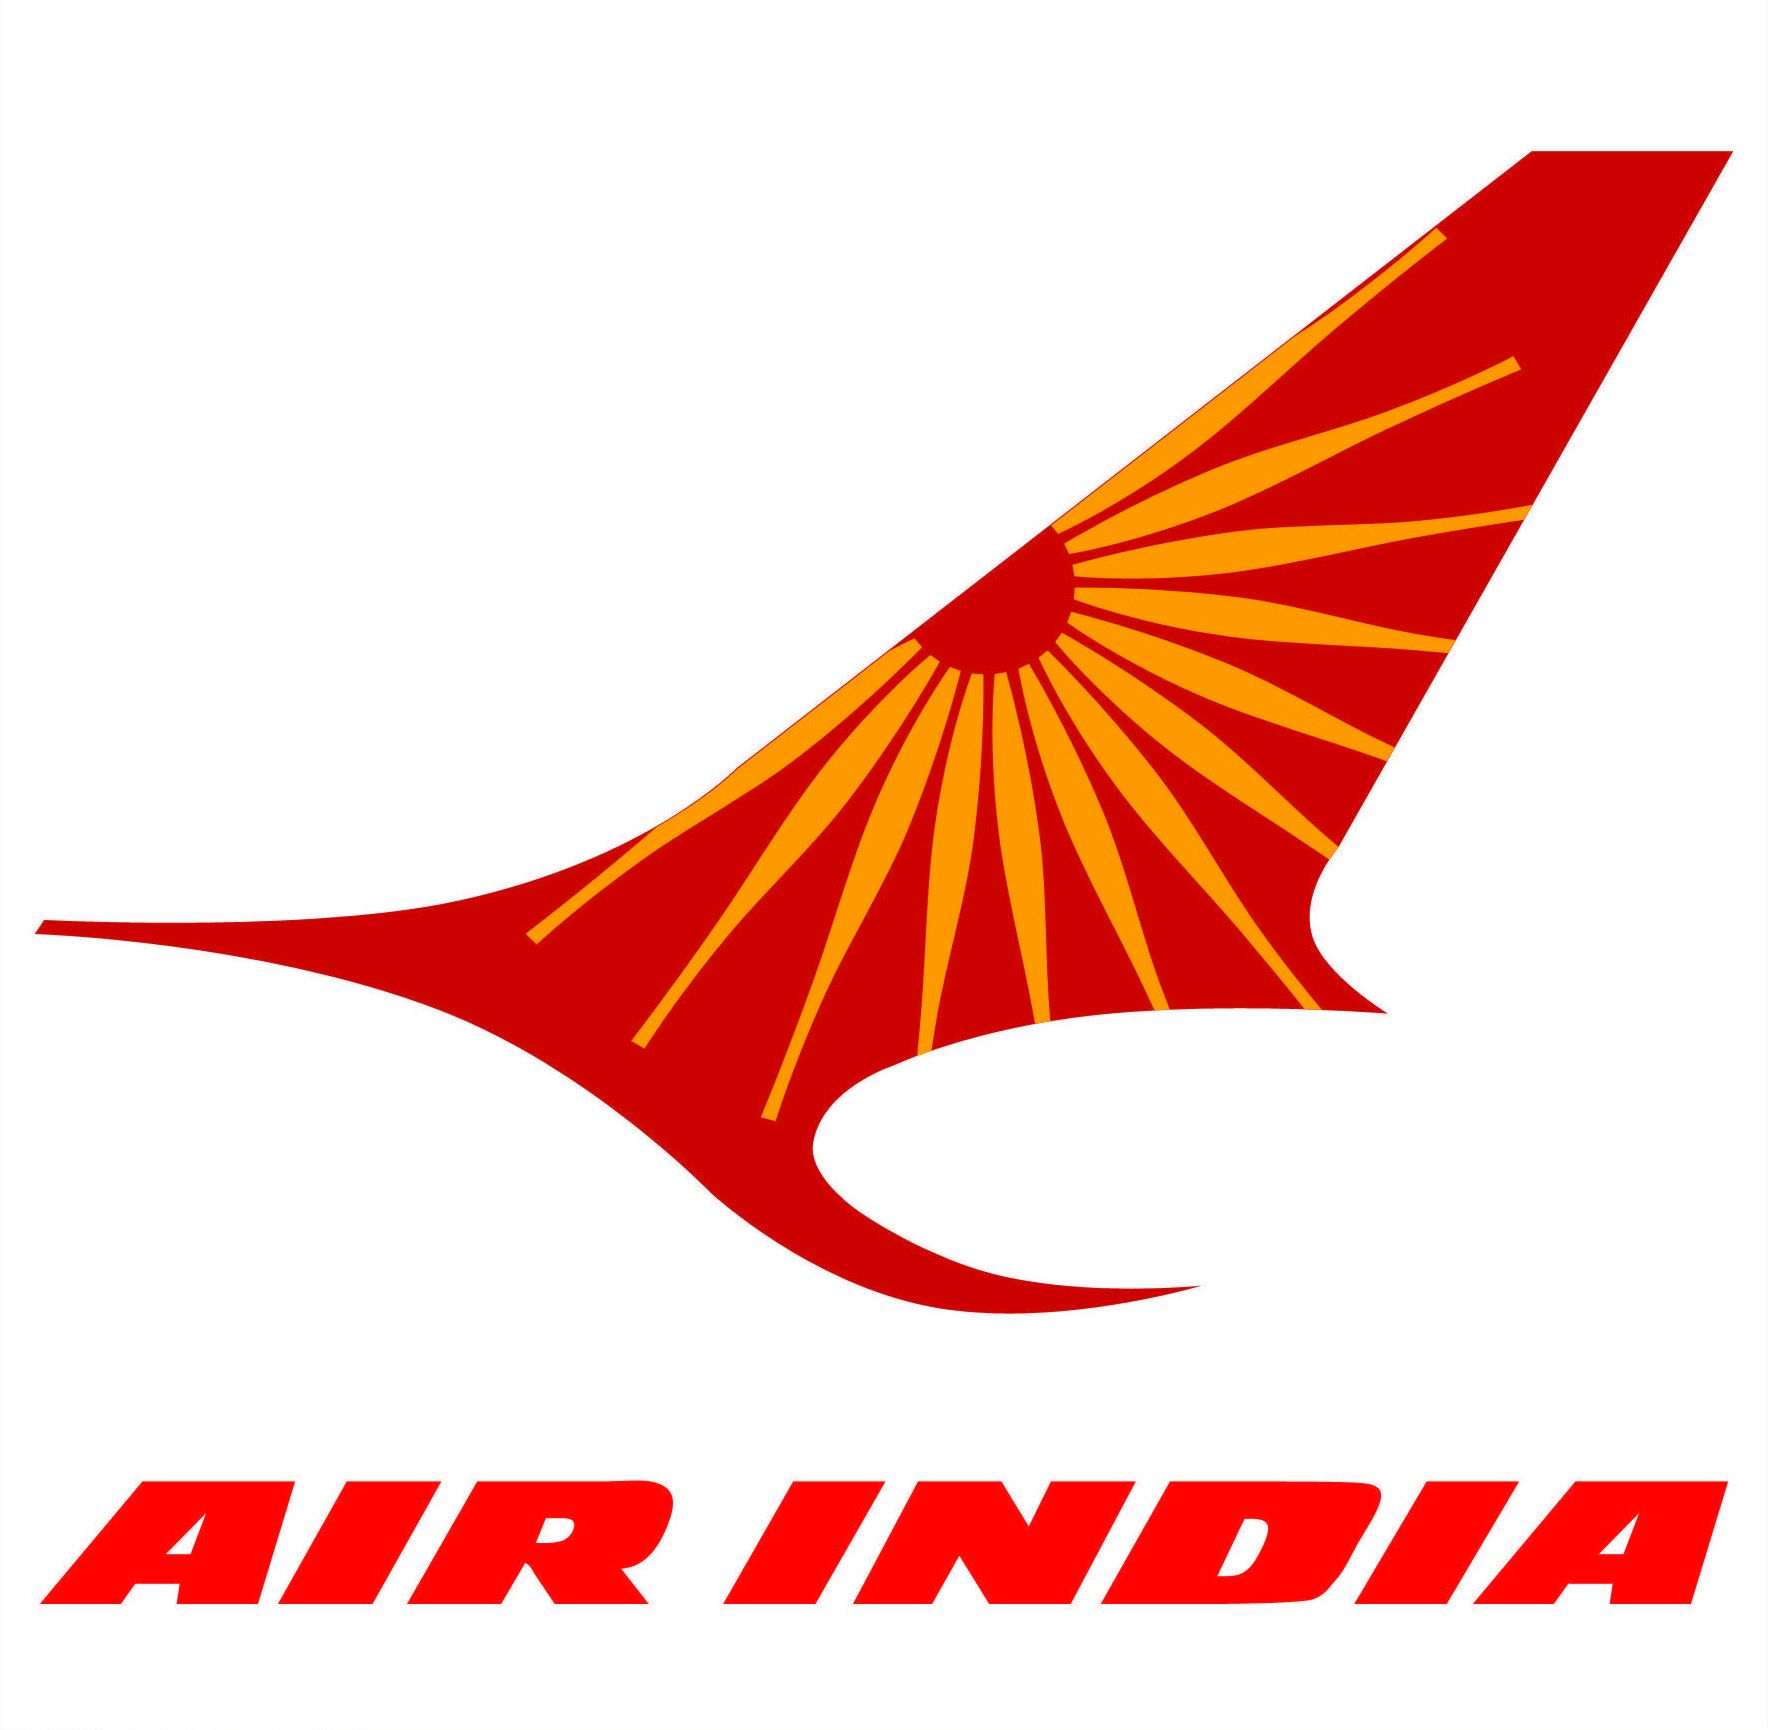 Air india logo india air india airline logo india logo